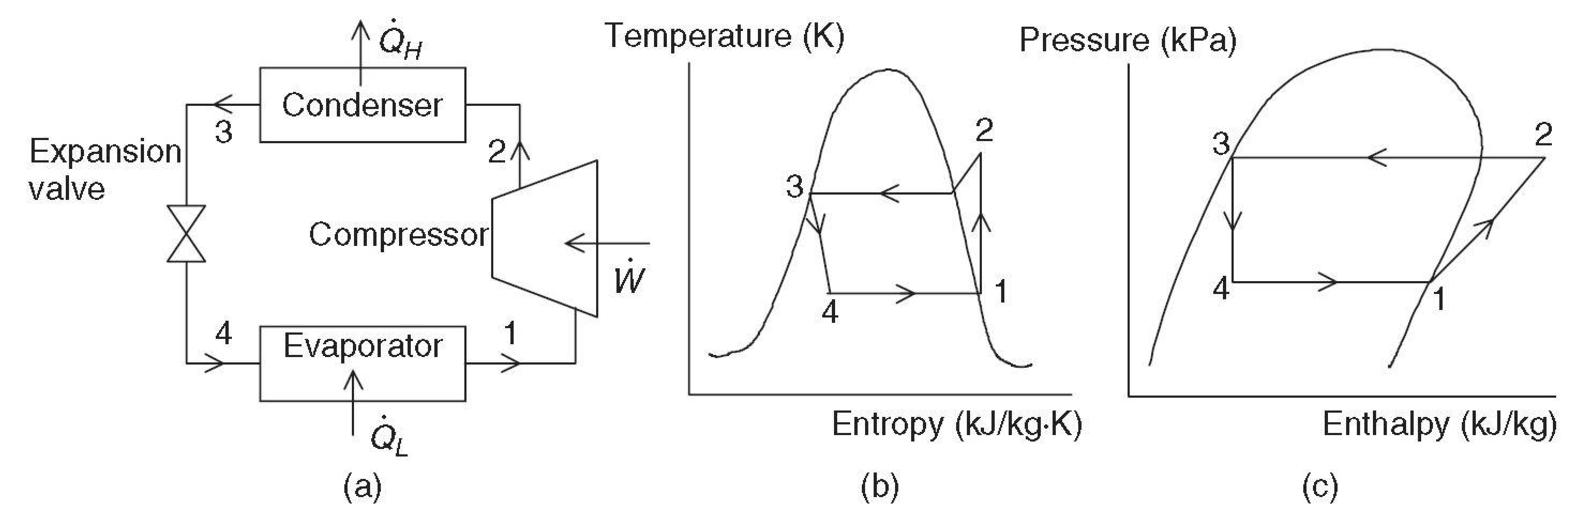 medium resolution of evaporator hvac diagram wiring diagrams schematics condenser coil drawing condenser coil diagram